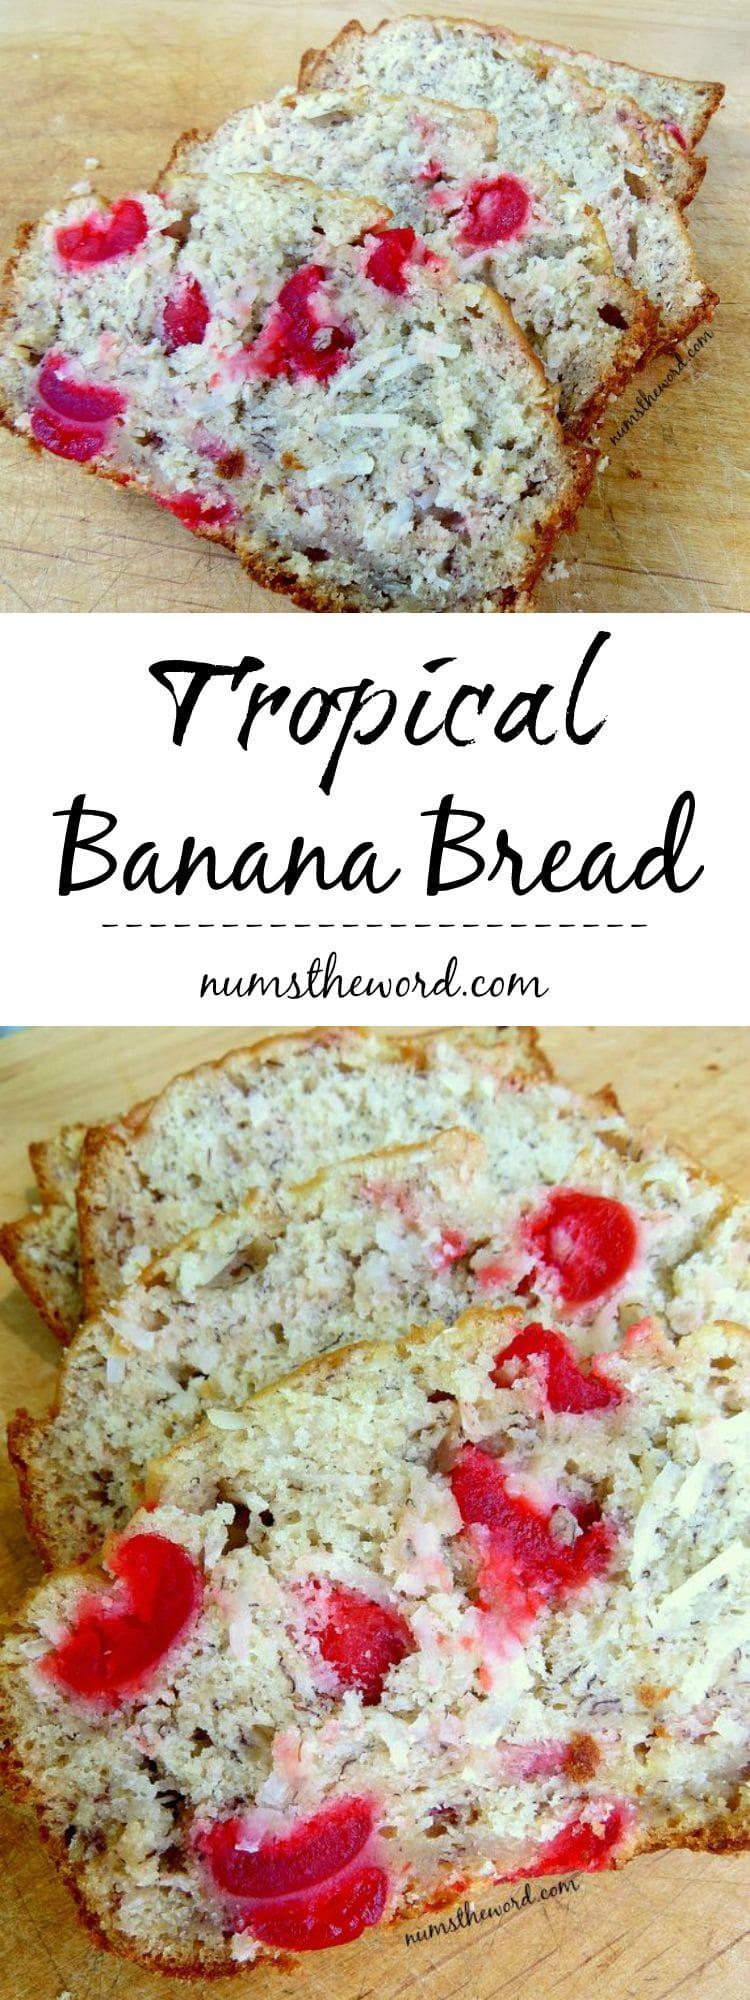 Tropical Banana Bread